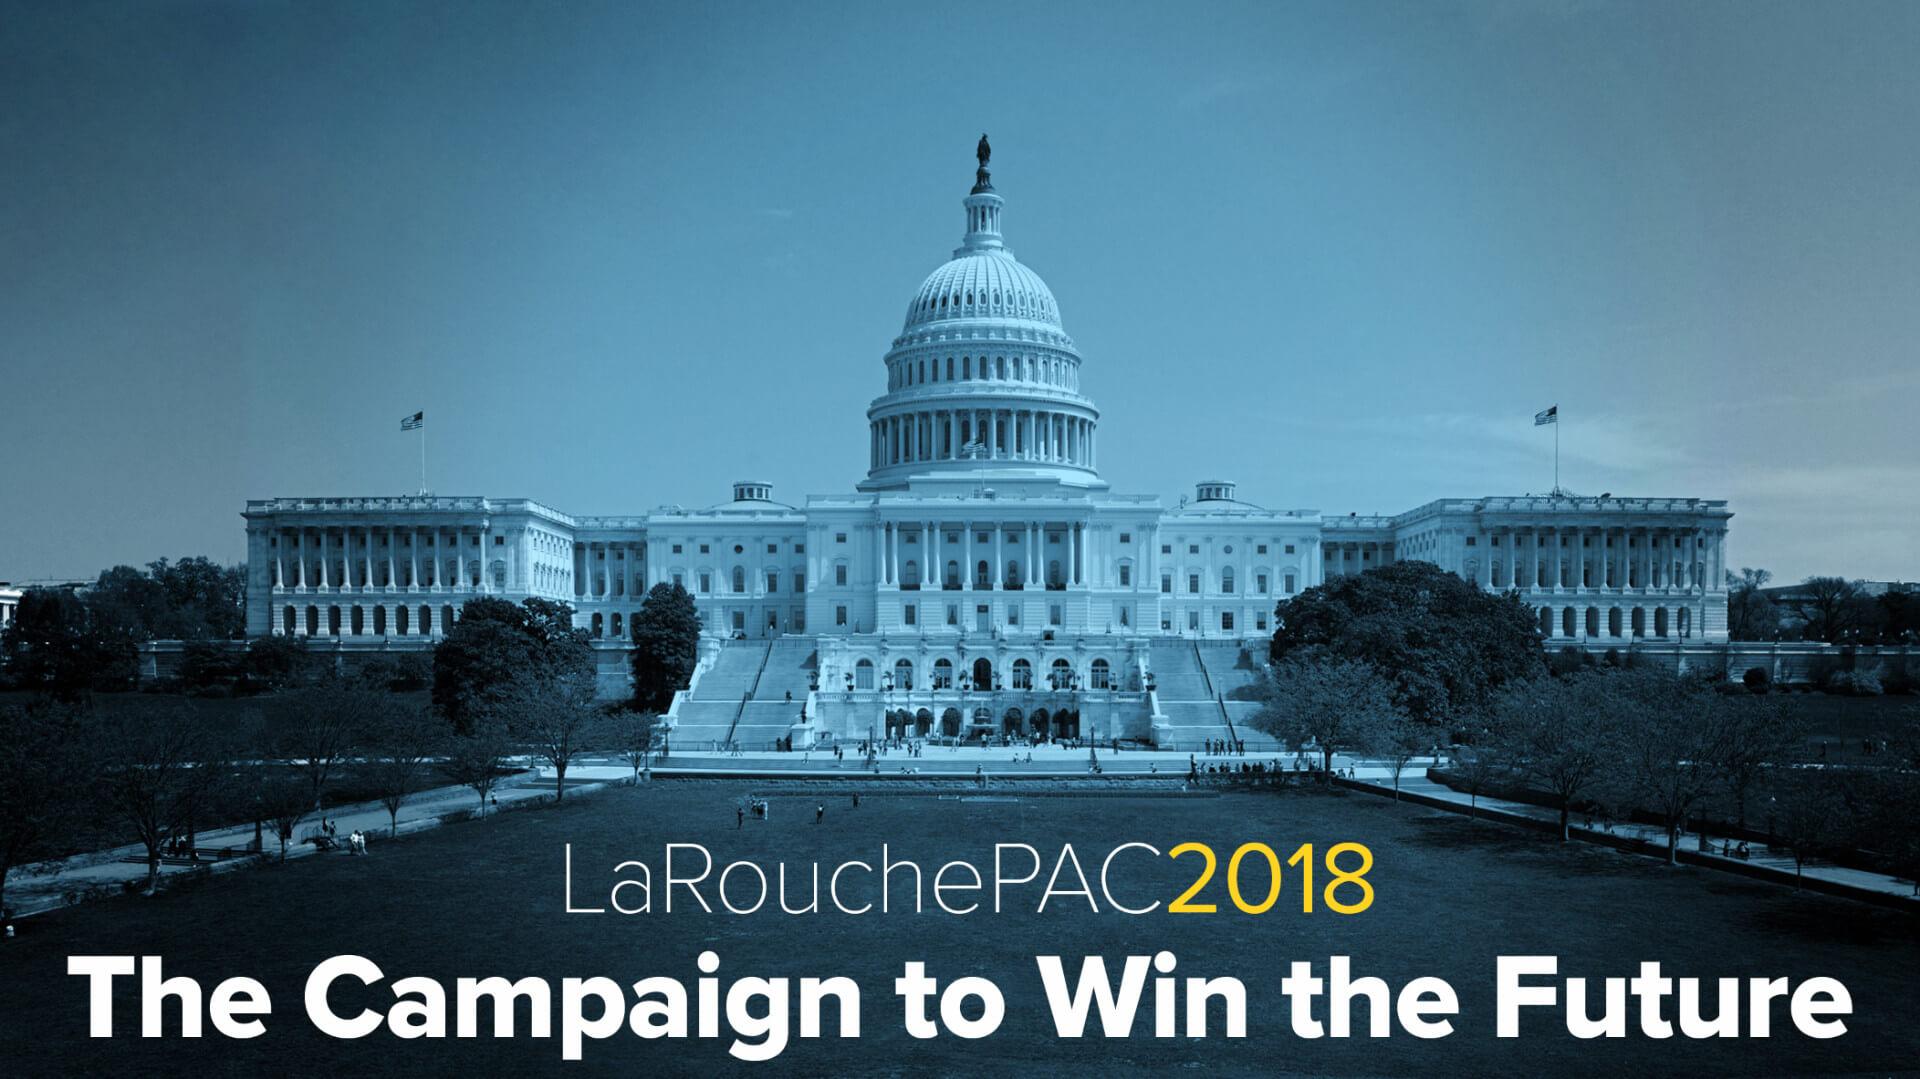 Campaign_to_Win_1-resize-mini.jpg